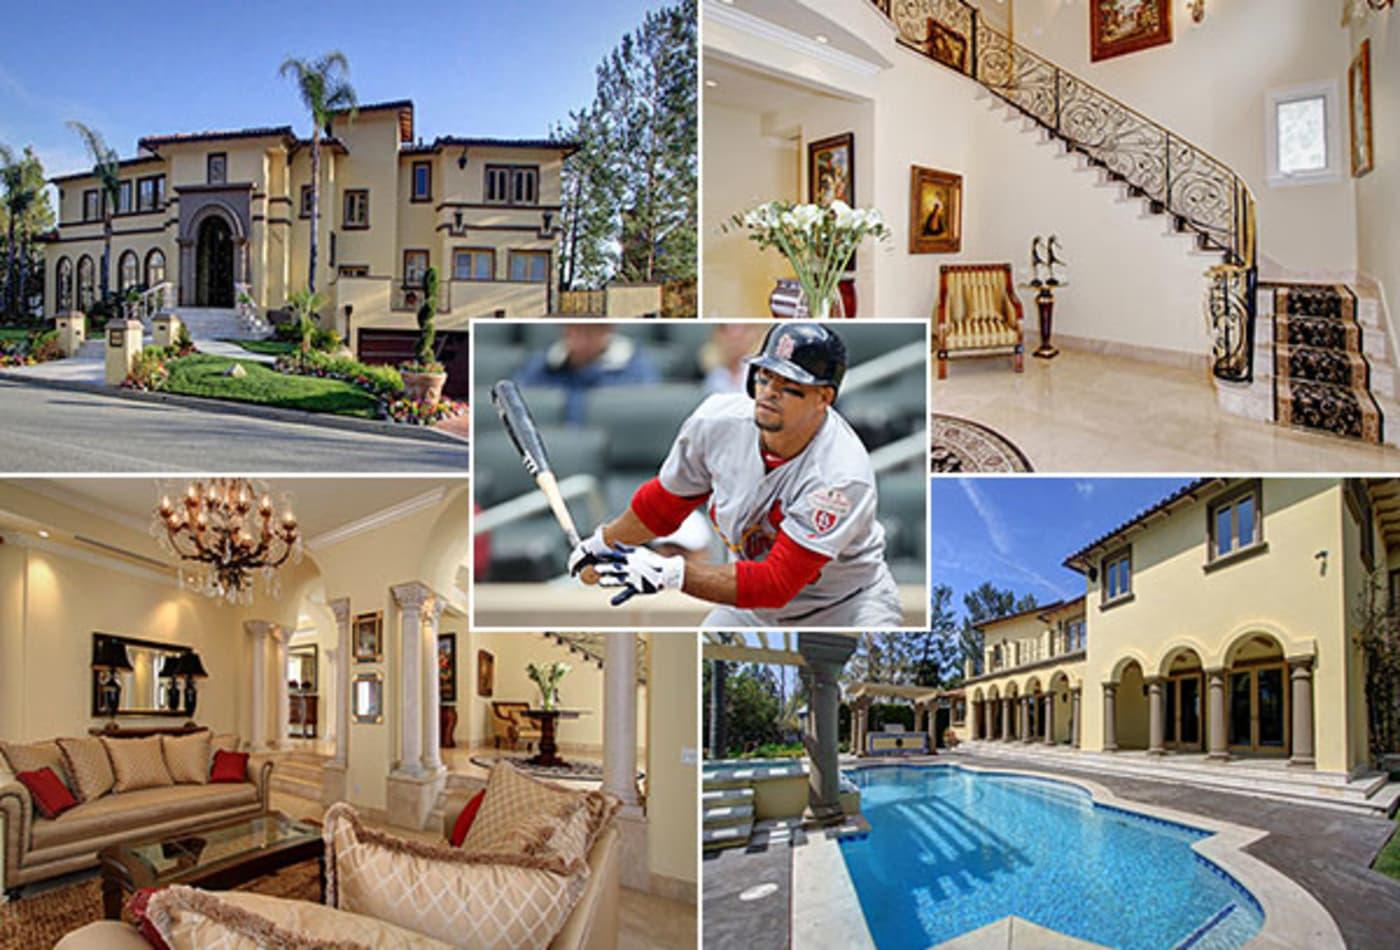 Rafael-Furcal-Coolest-Athlete-Homes.jpg